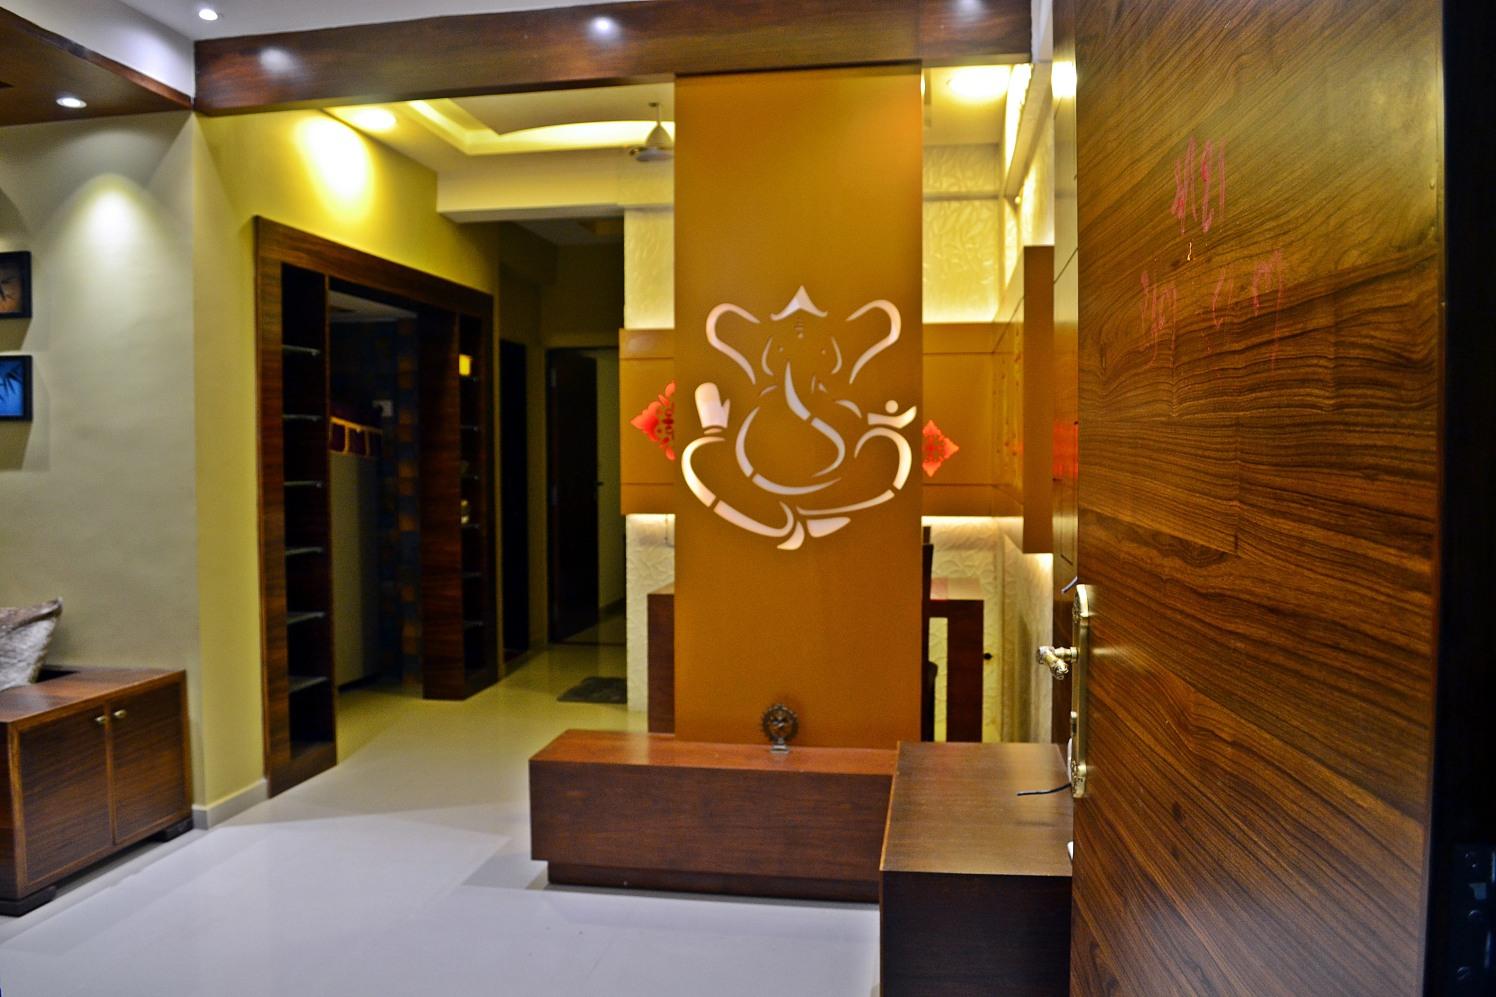 Hallway With Wooden Pillar by Ankita Patel Indoor-spaces Contemporary | Interior Design Photos & Ideas